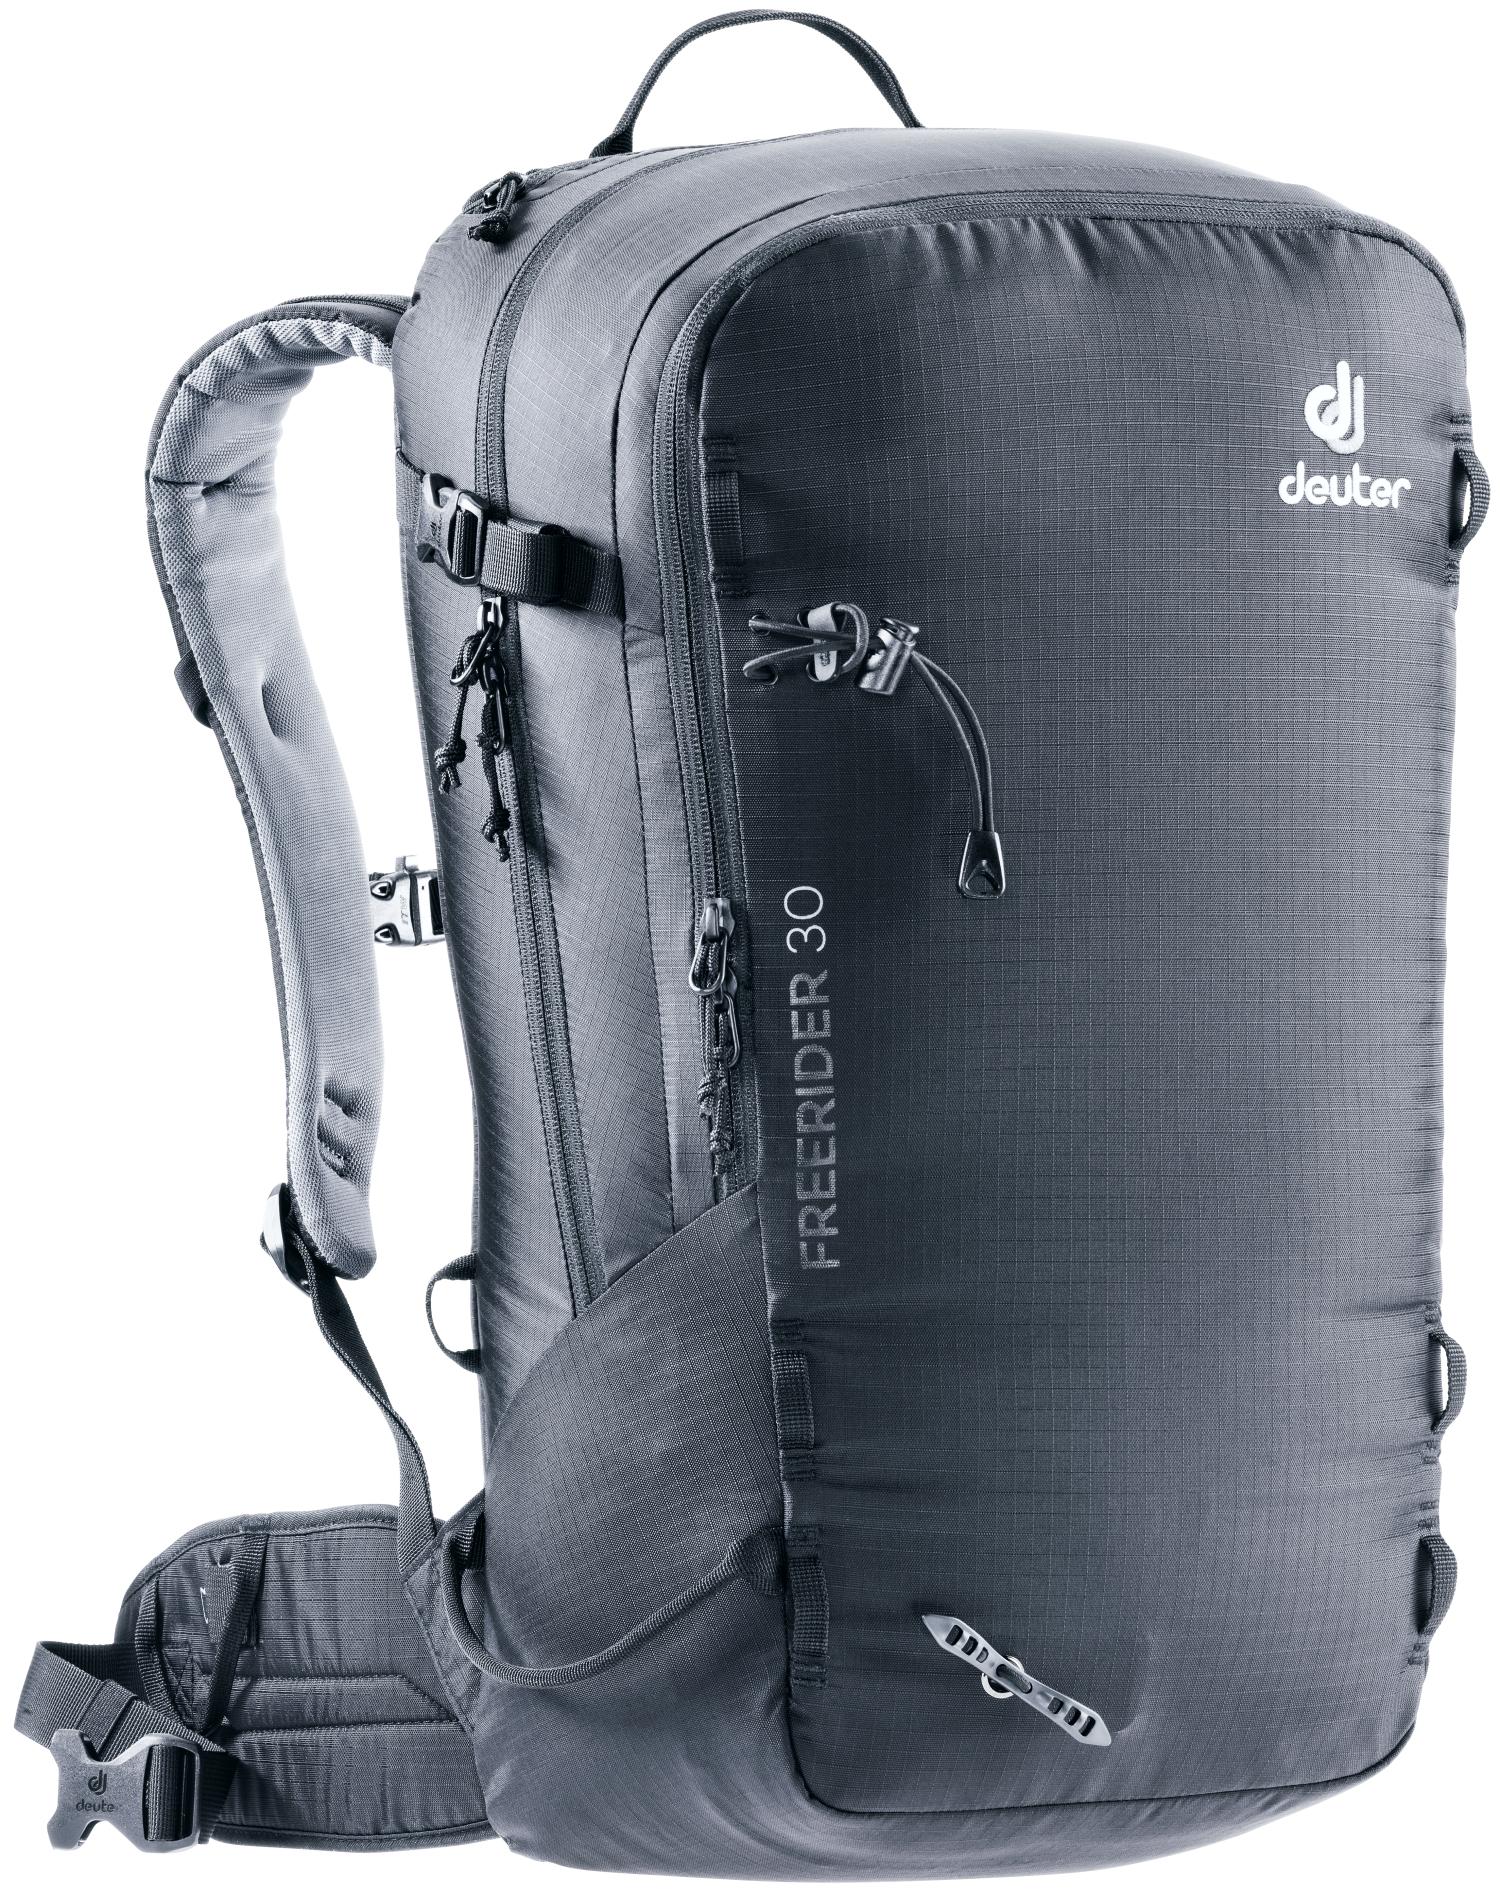 Рюкзаки для фрирайда Рюкзак сноубордический Deuter Freerider 30 3303321-7000-Freerider30-w20-d0.jpg